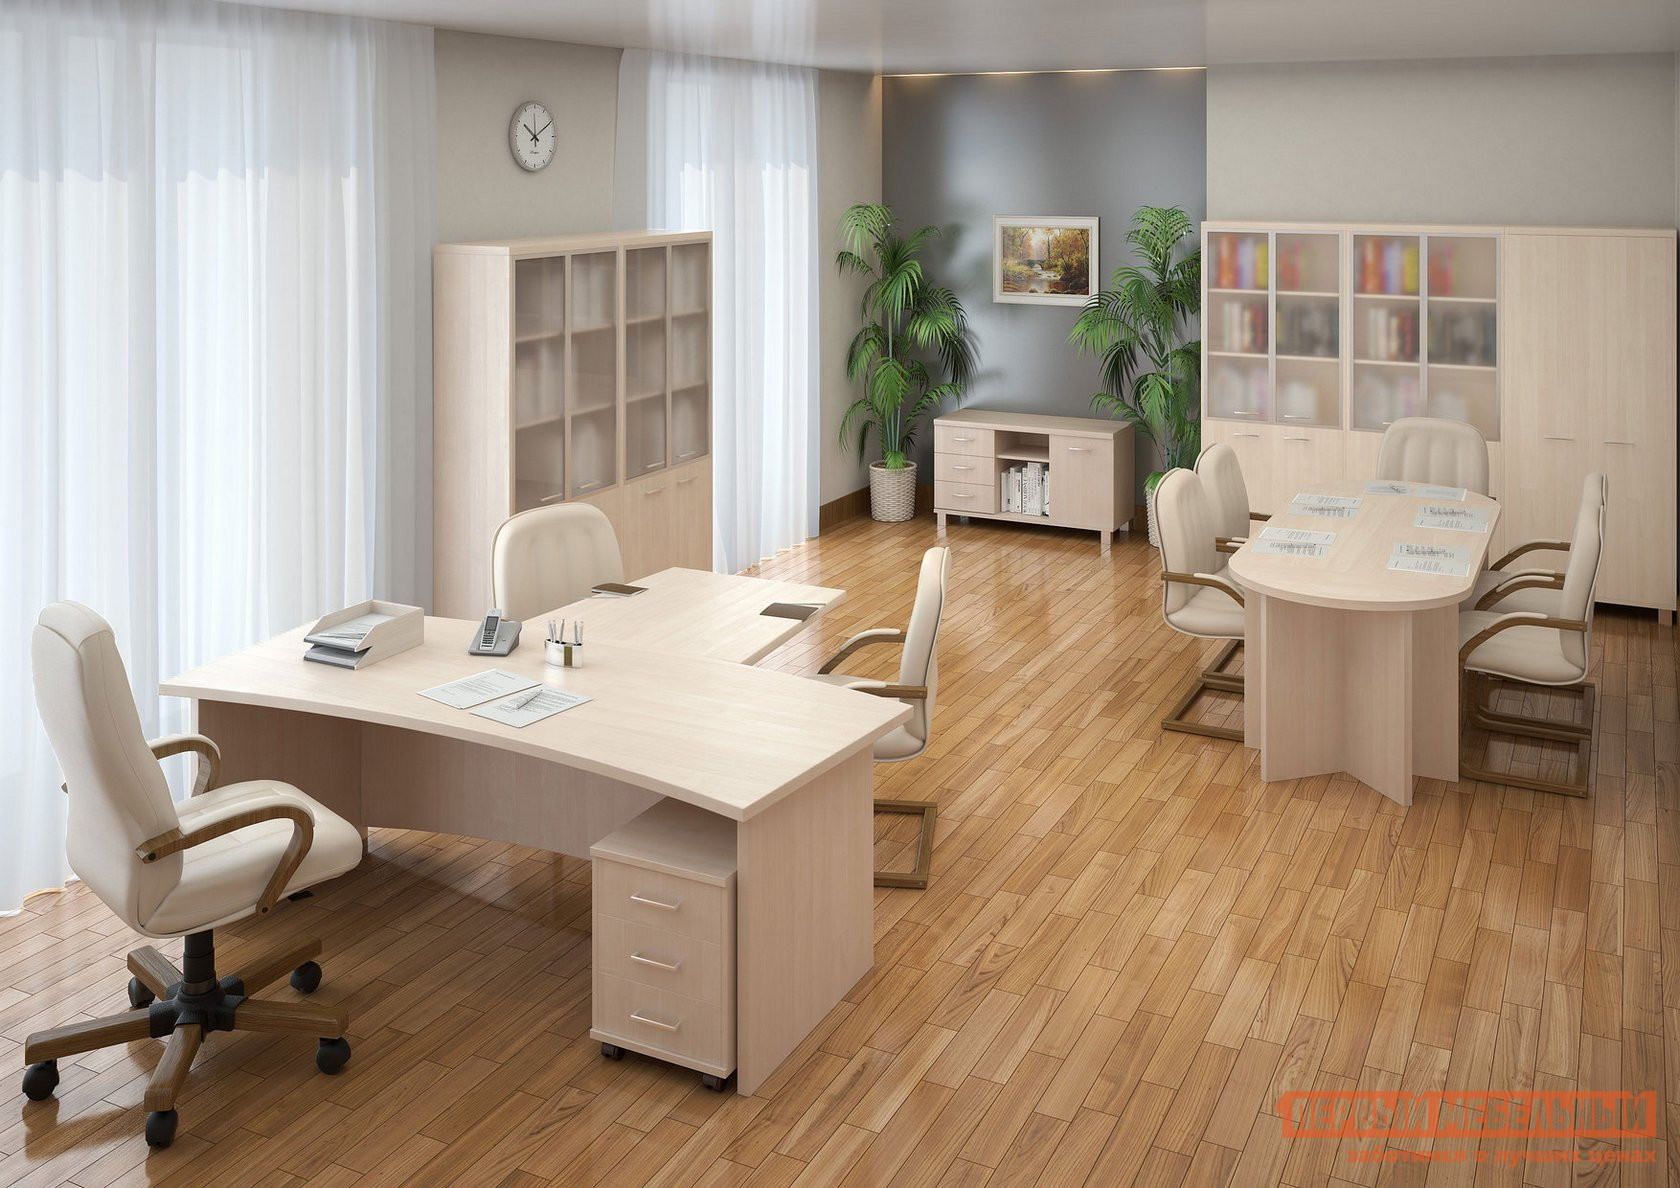 Комплект офисной мебели Riva Фёст Клен К1 комплект детской мебели трия аватар лаванда к1